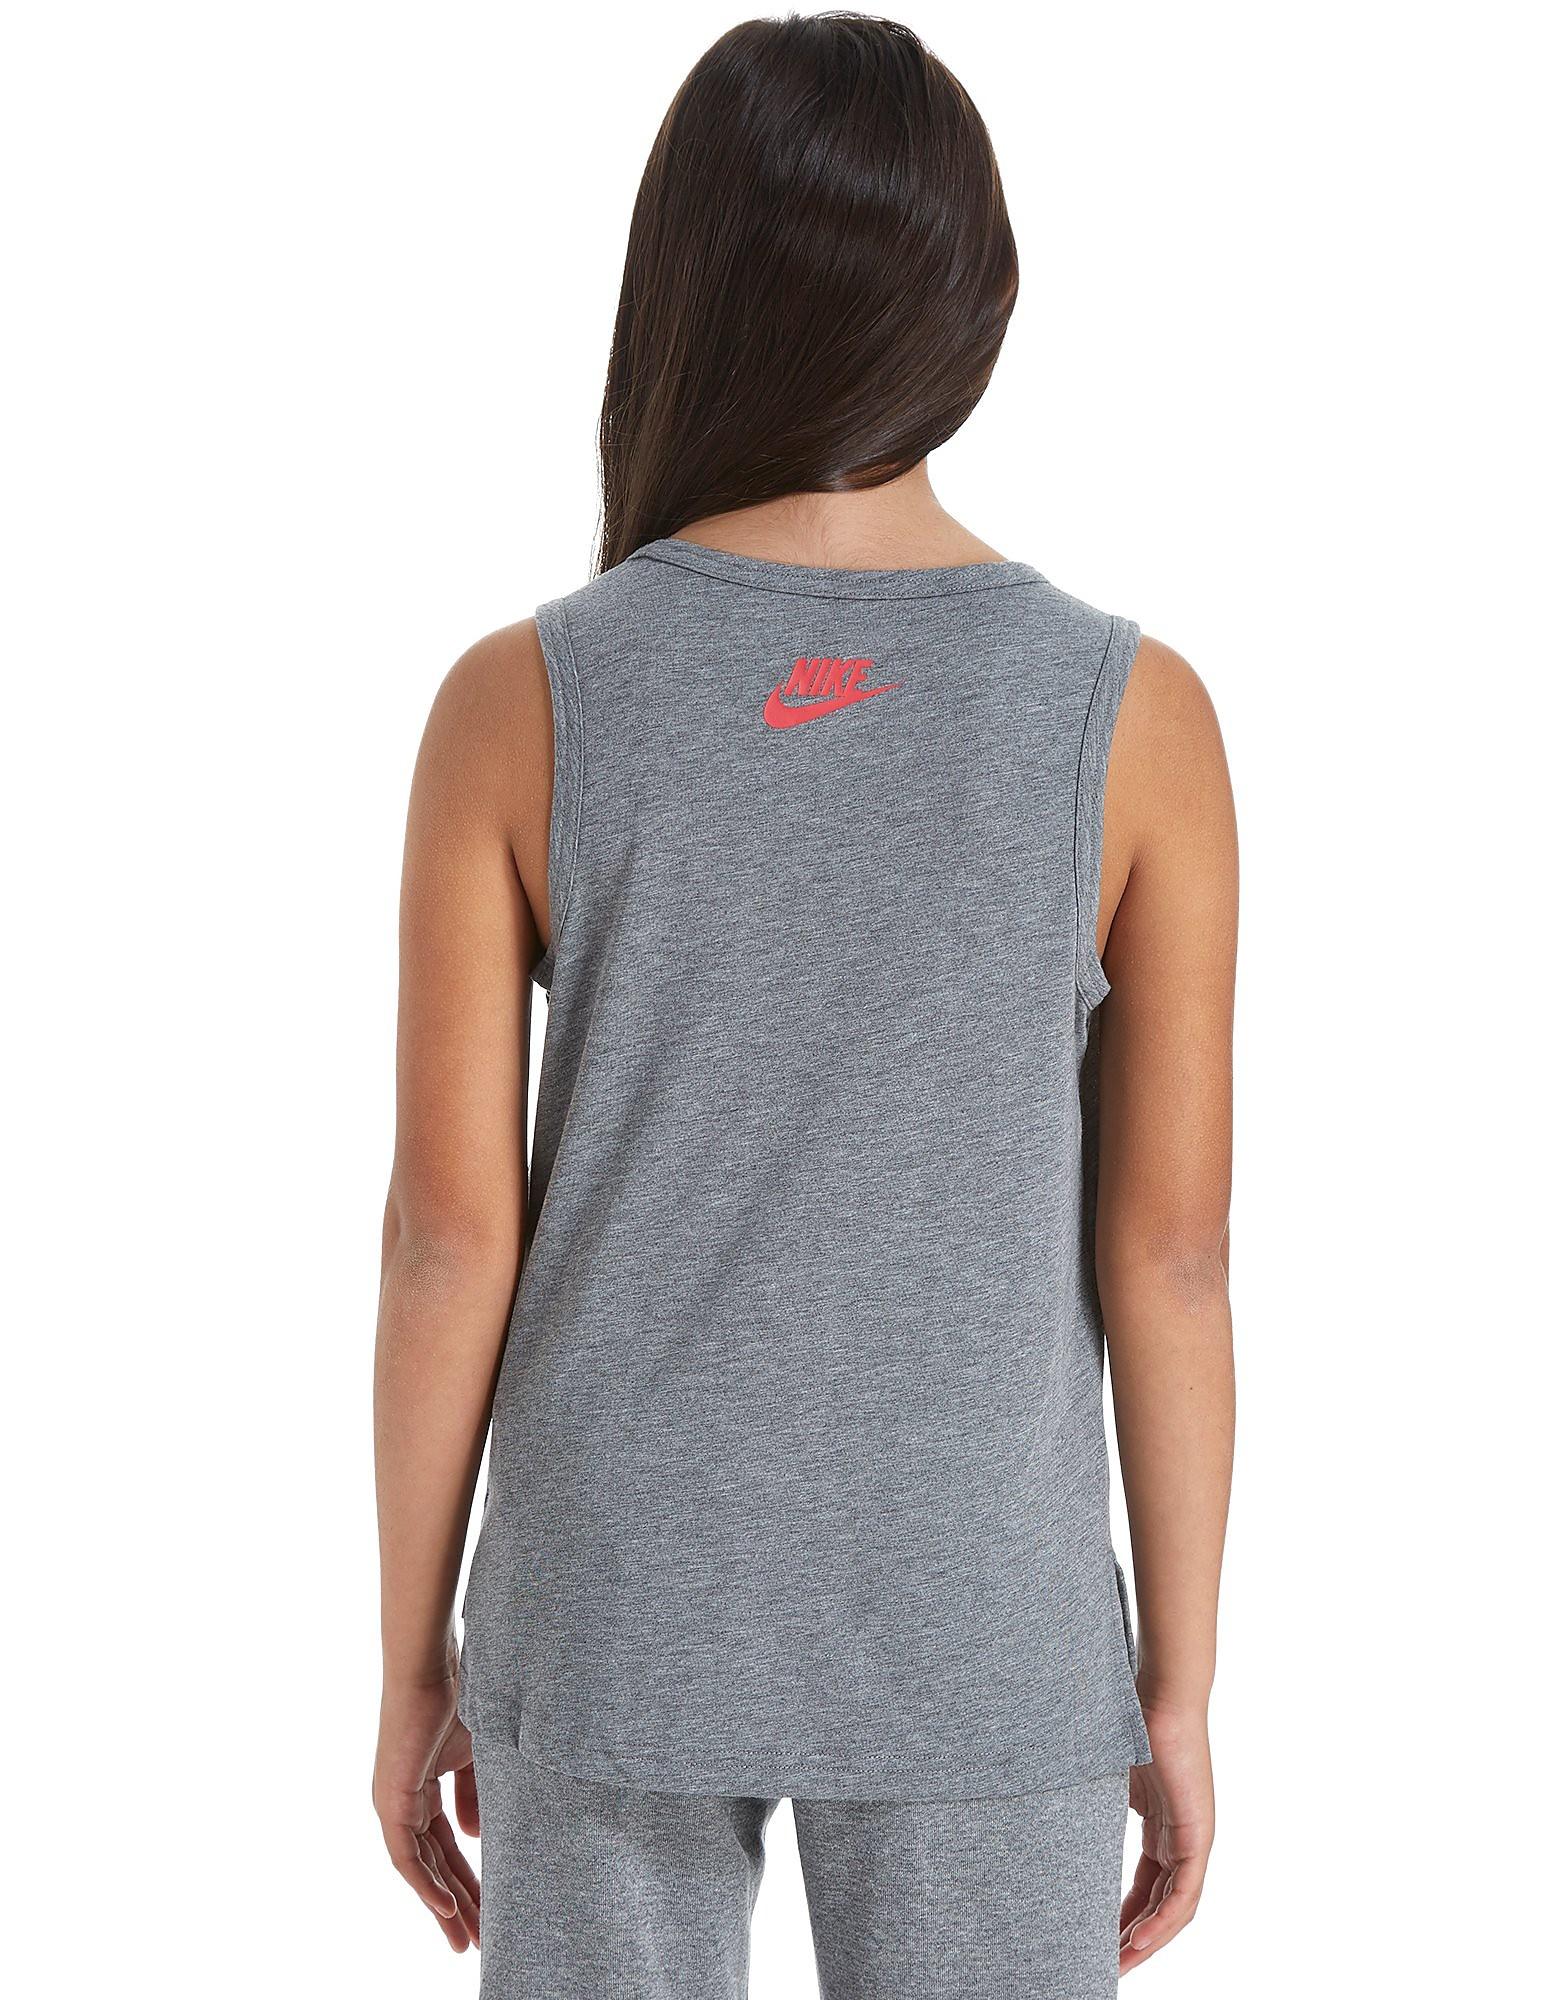 Nike Girls' Just Do It Muscle Tank Junior